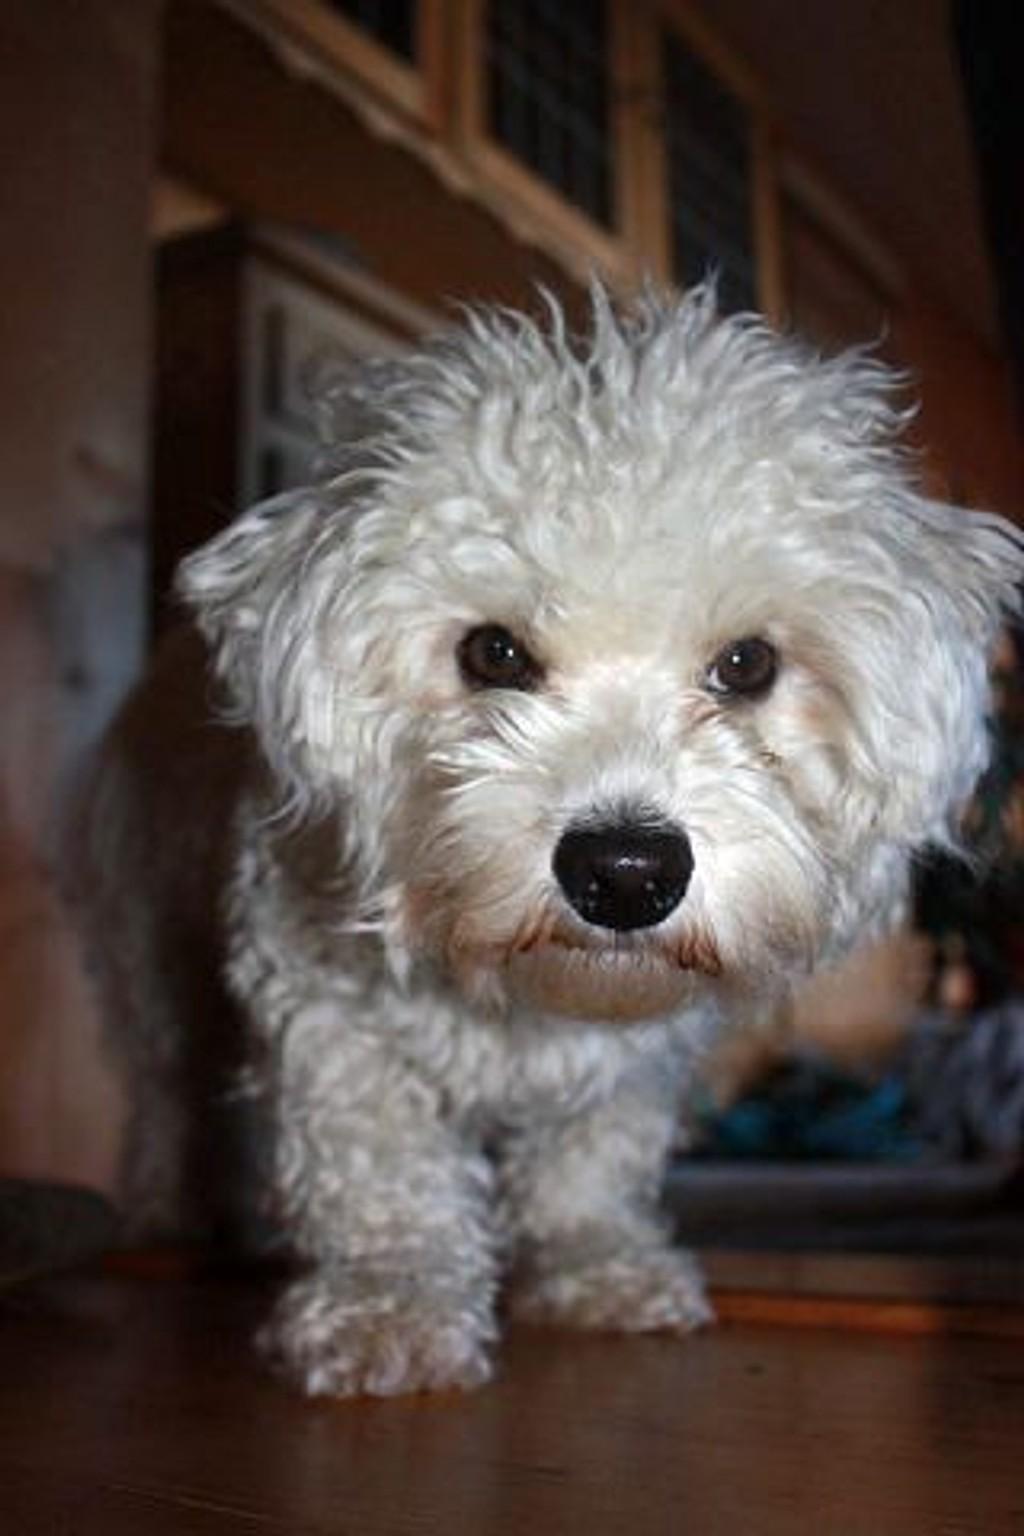 Stewie har vært savnet siden 28. desember.